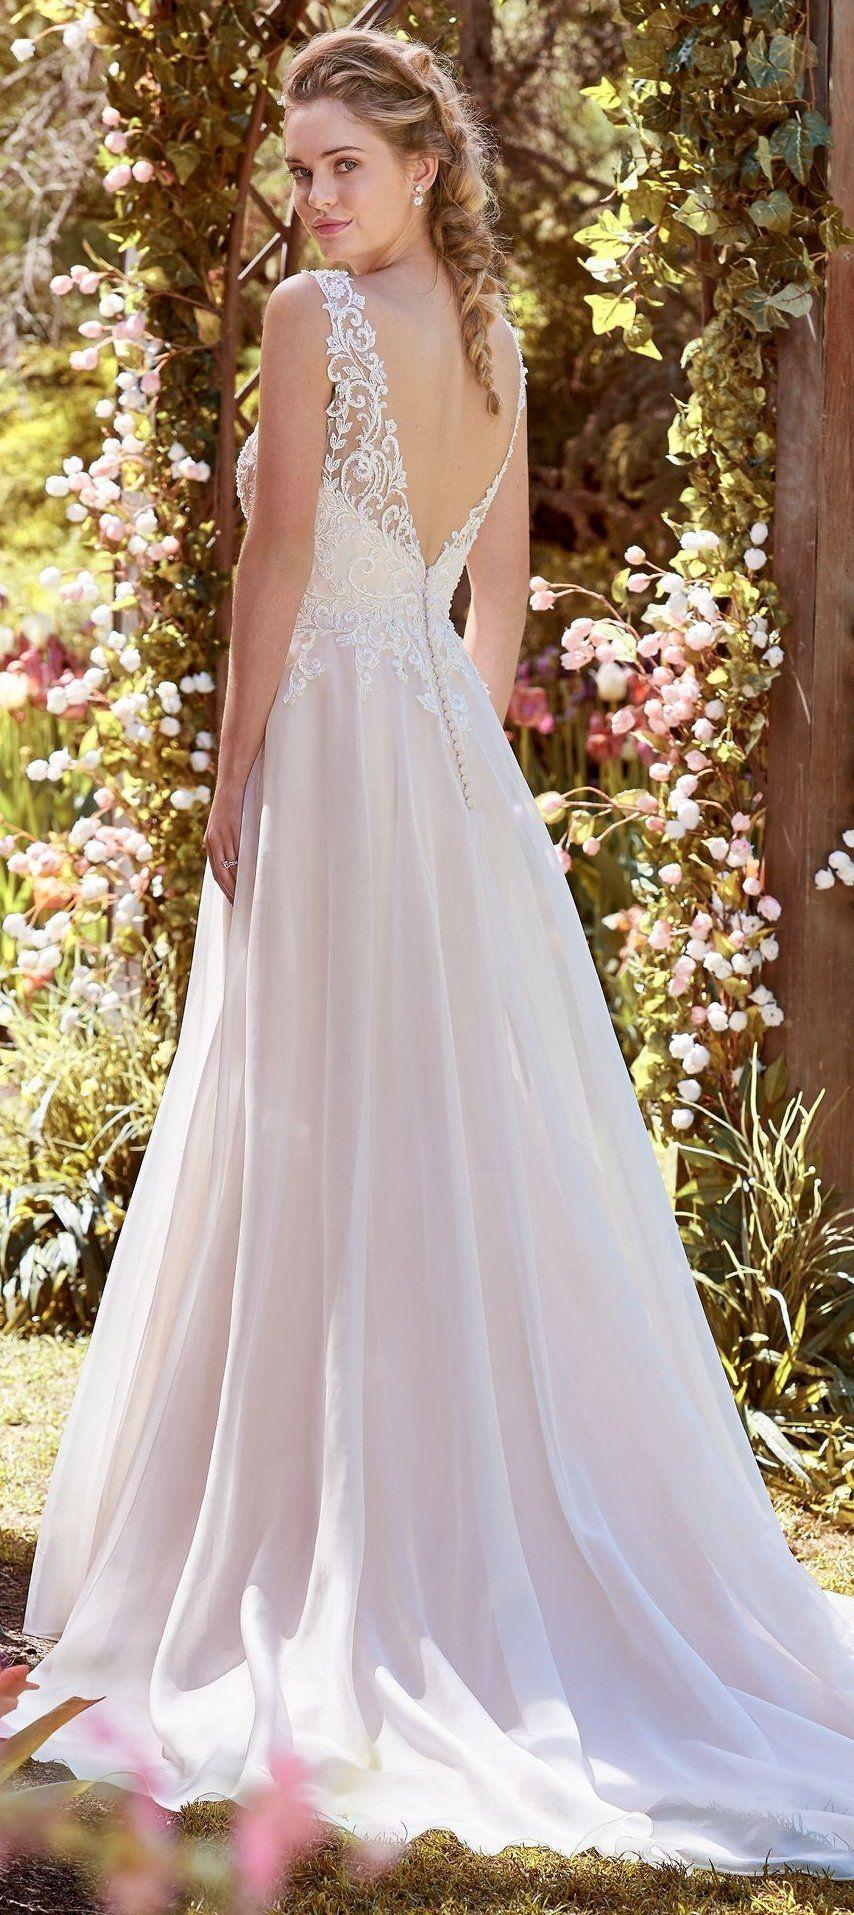 Joyce by rebecca ingram wedding dresses wedding dresses